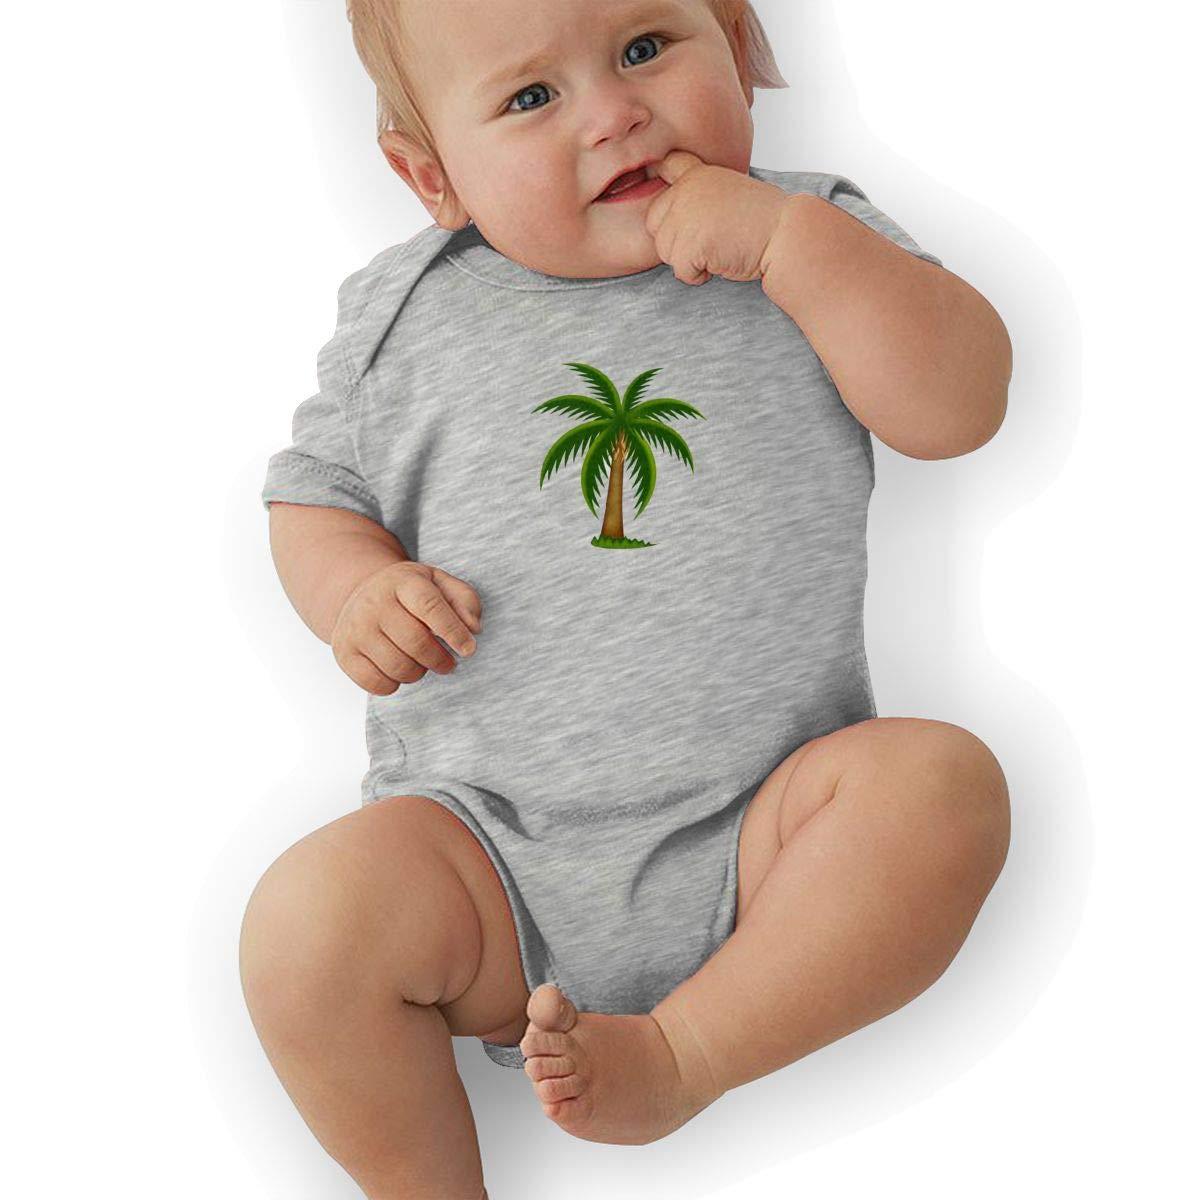 BONLOR Palm Tree Baby Boys Girls Jumpsuit Overall Romper Bodysuit Summer Clothes Gray